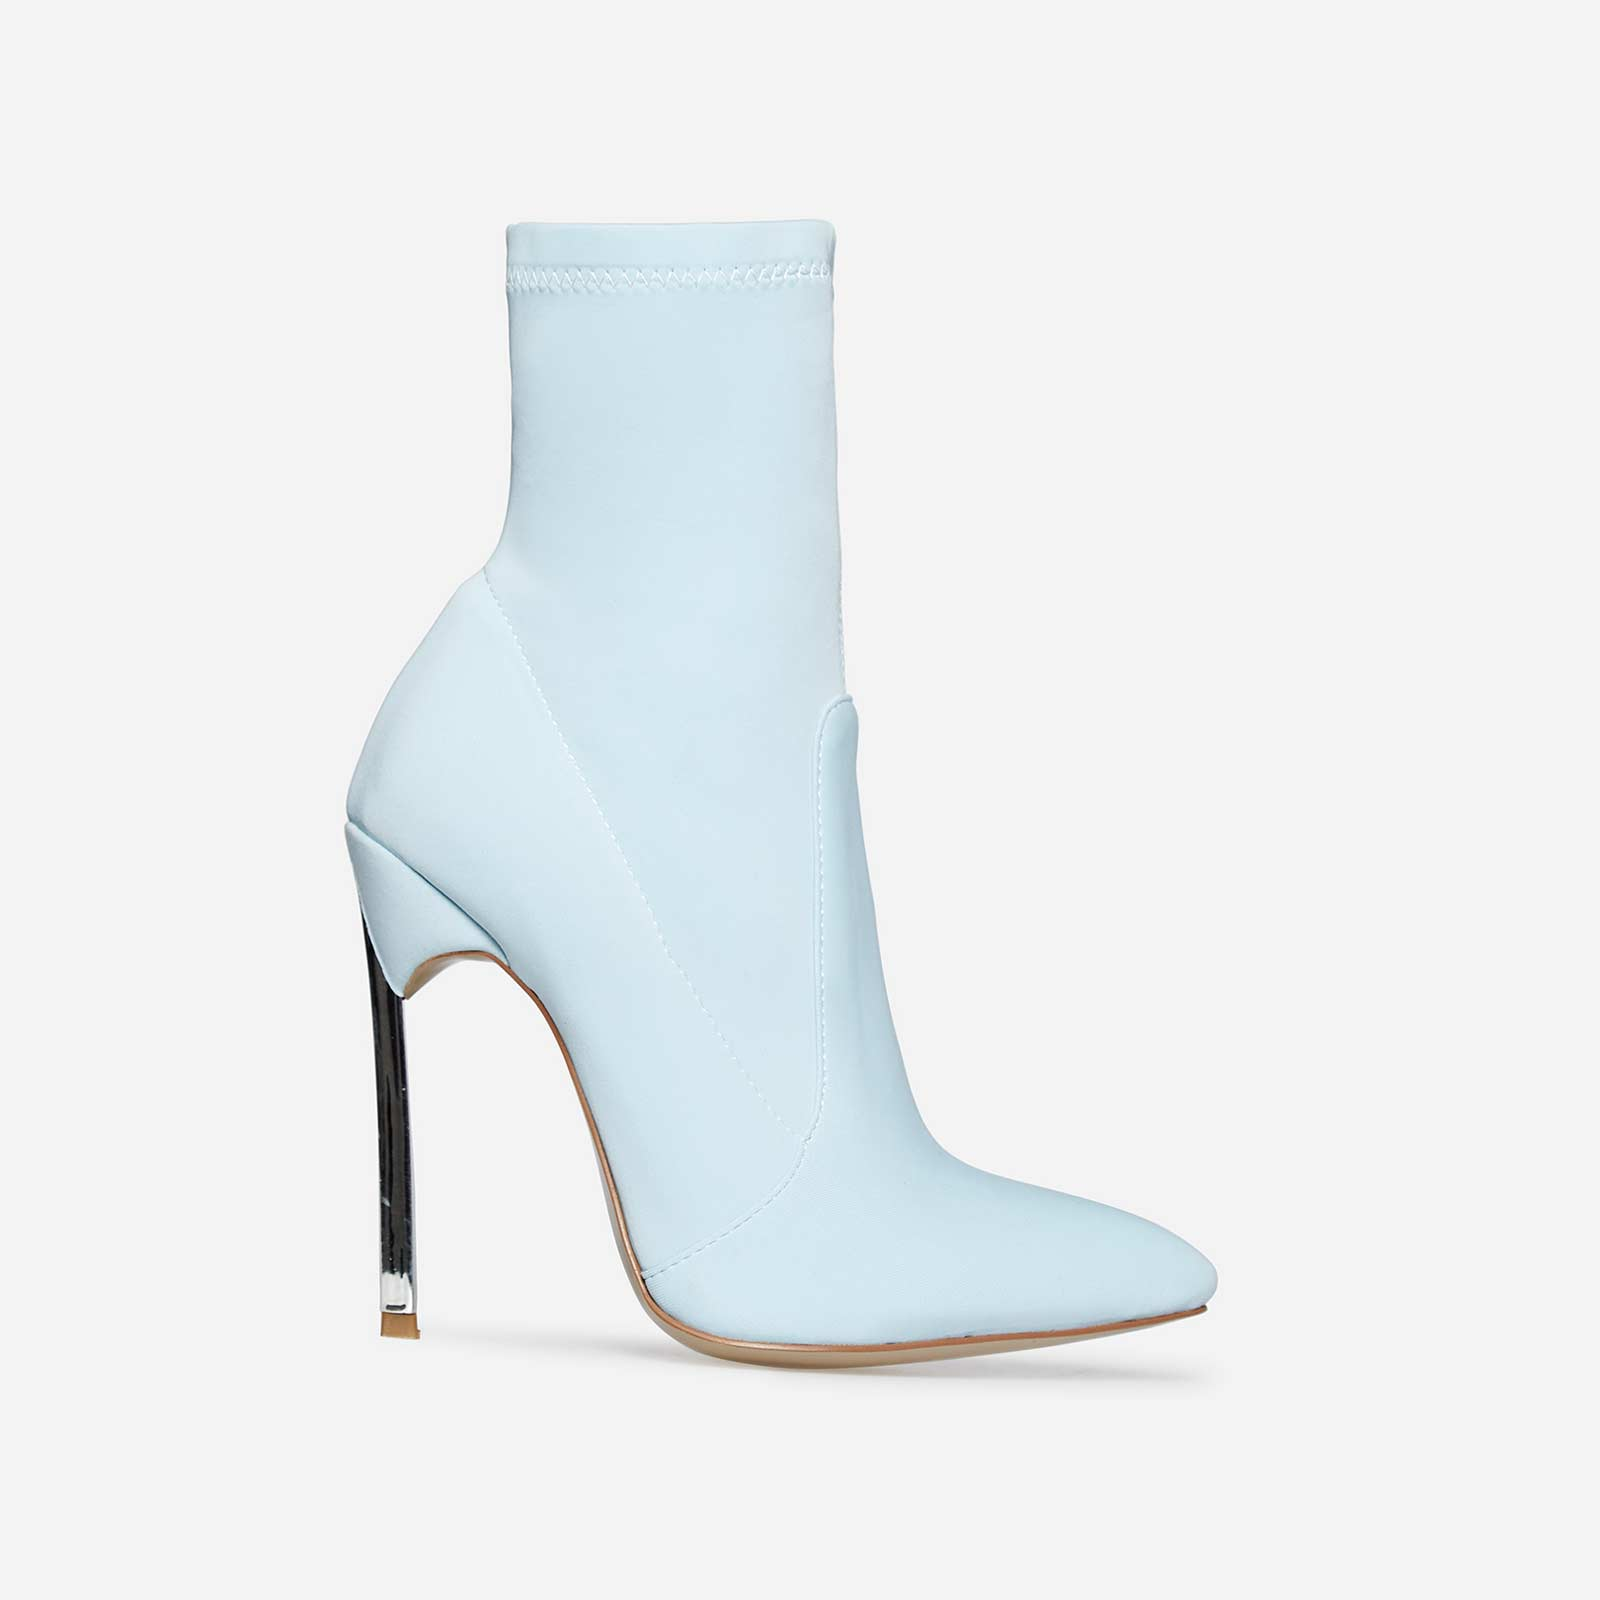 Ava Skinny Heel Pointed Toe Sock Boot In Pastel Blue Lycra